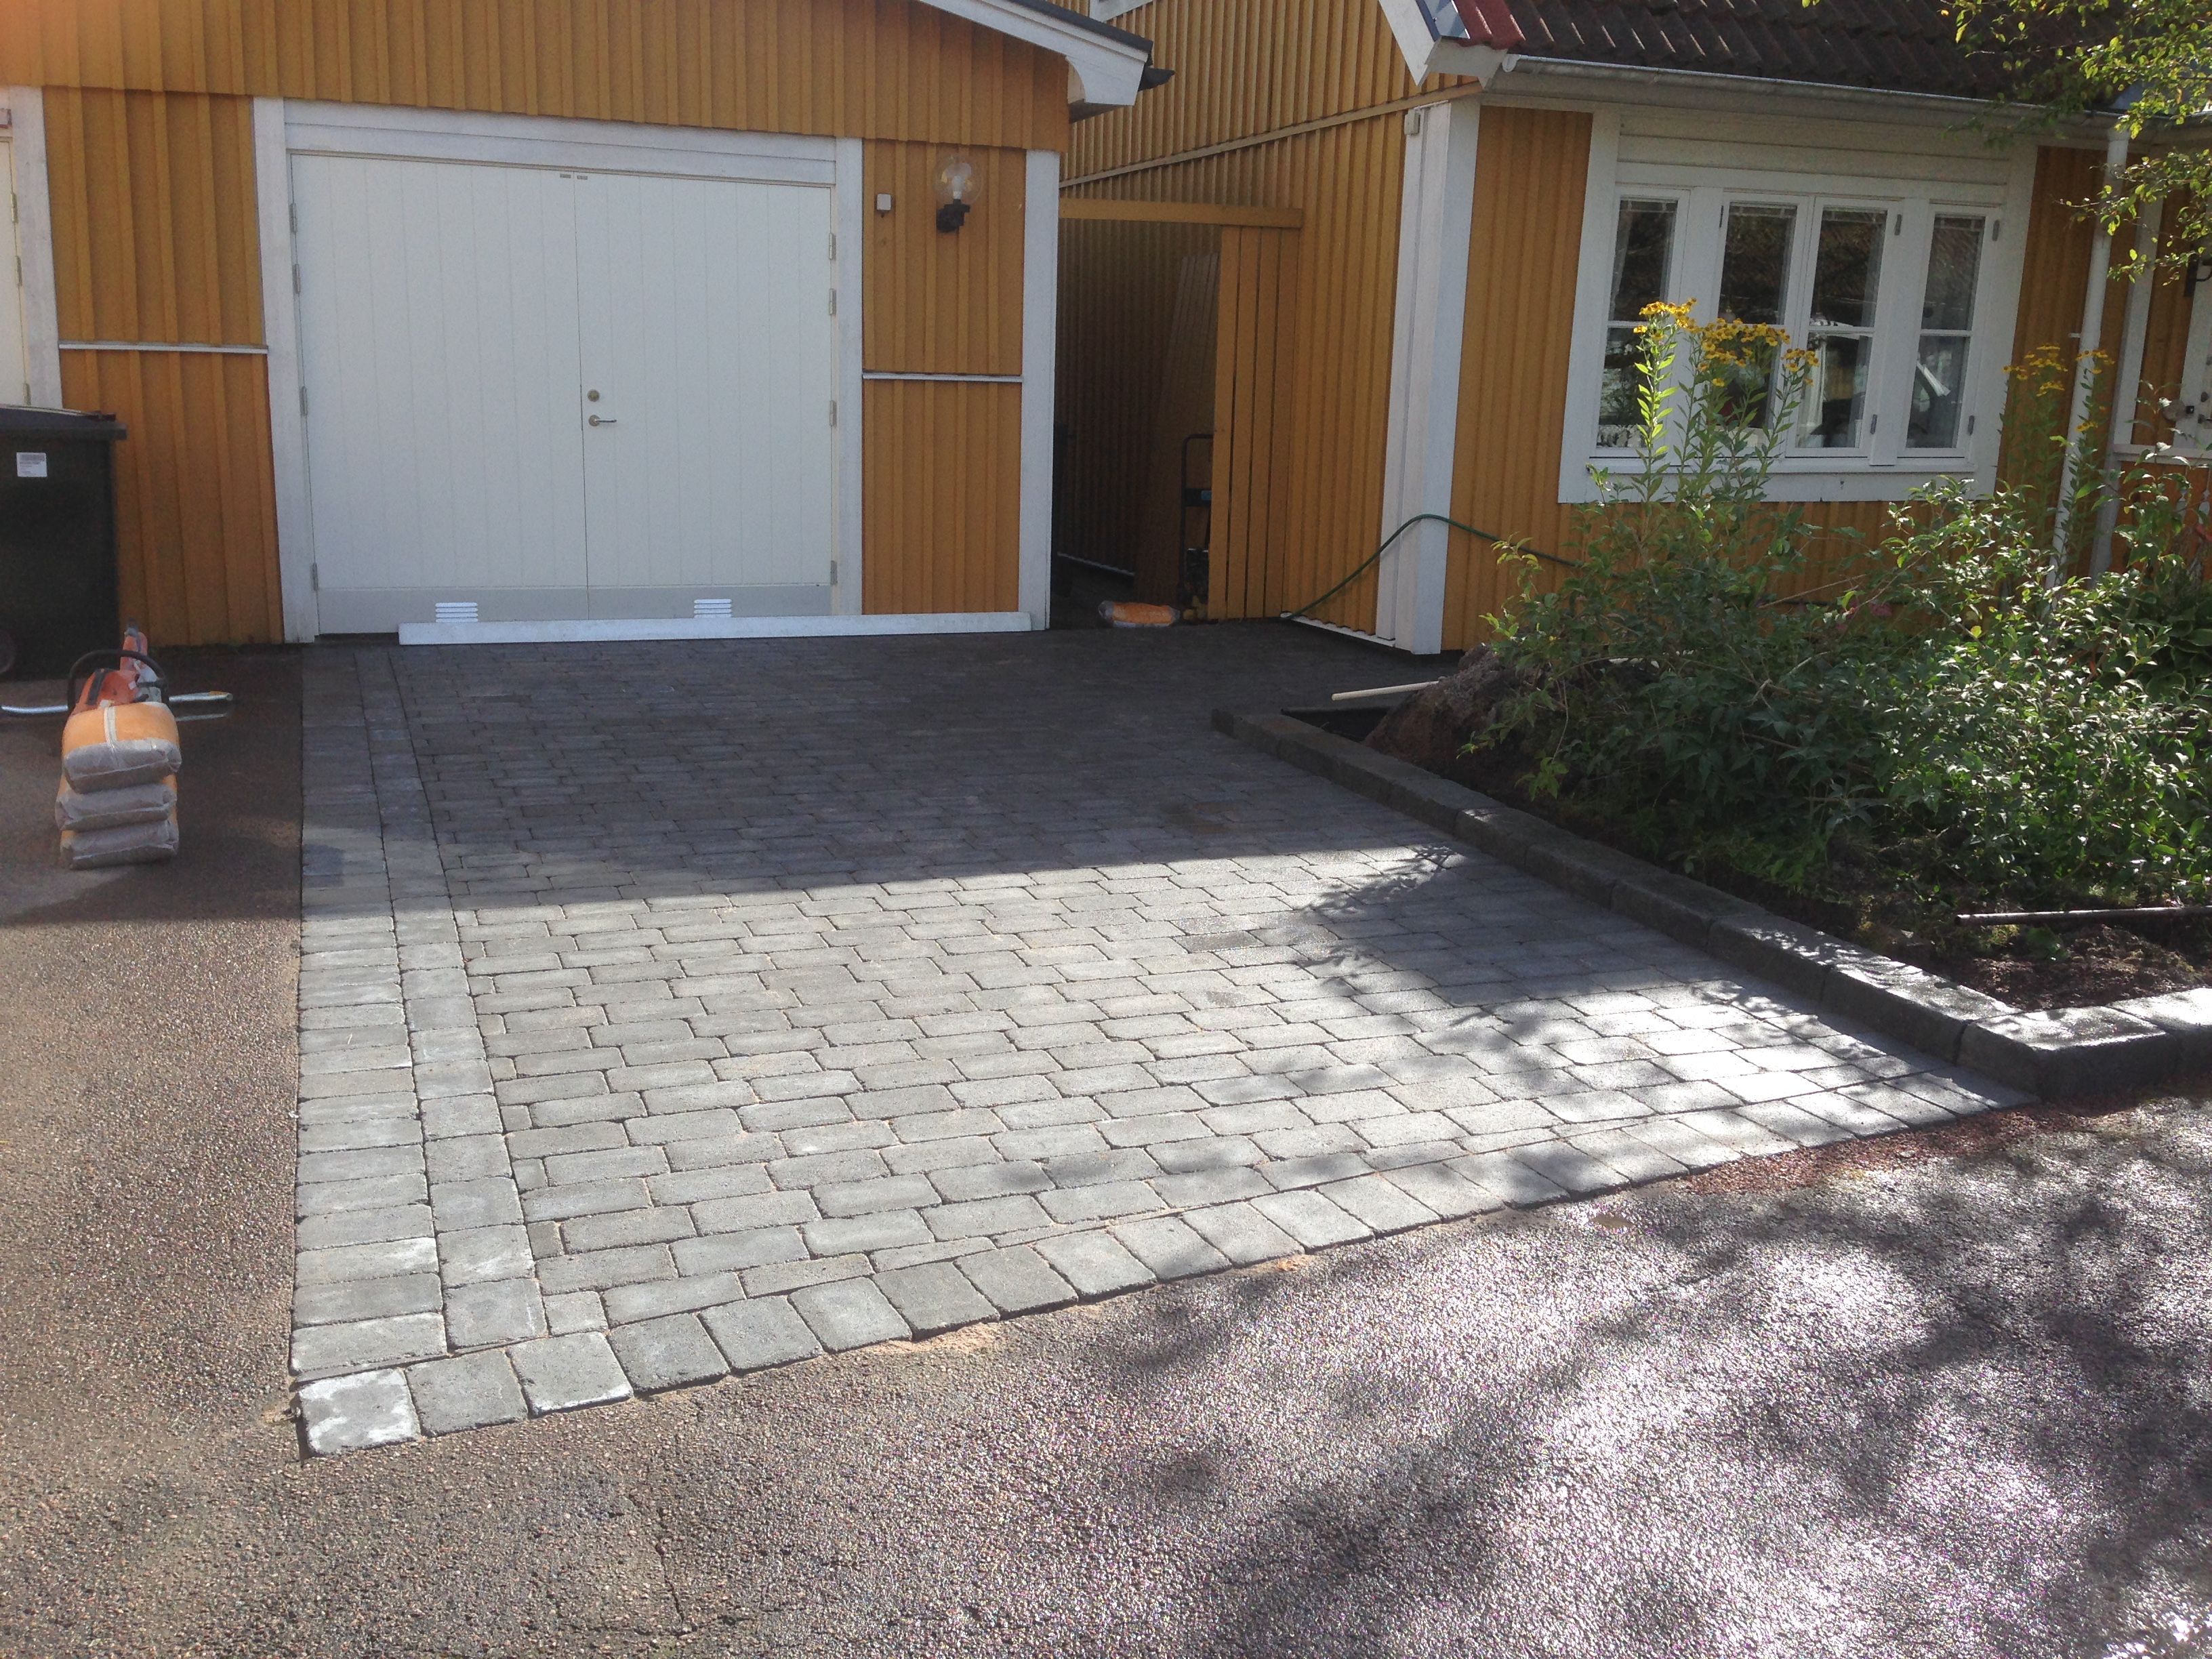 Brunörtsgatan 22 Karlstad 09092016